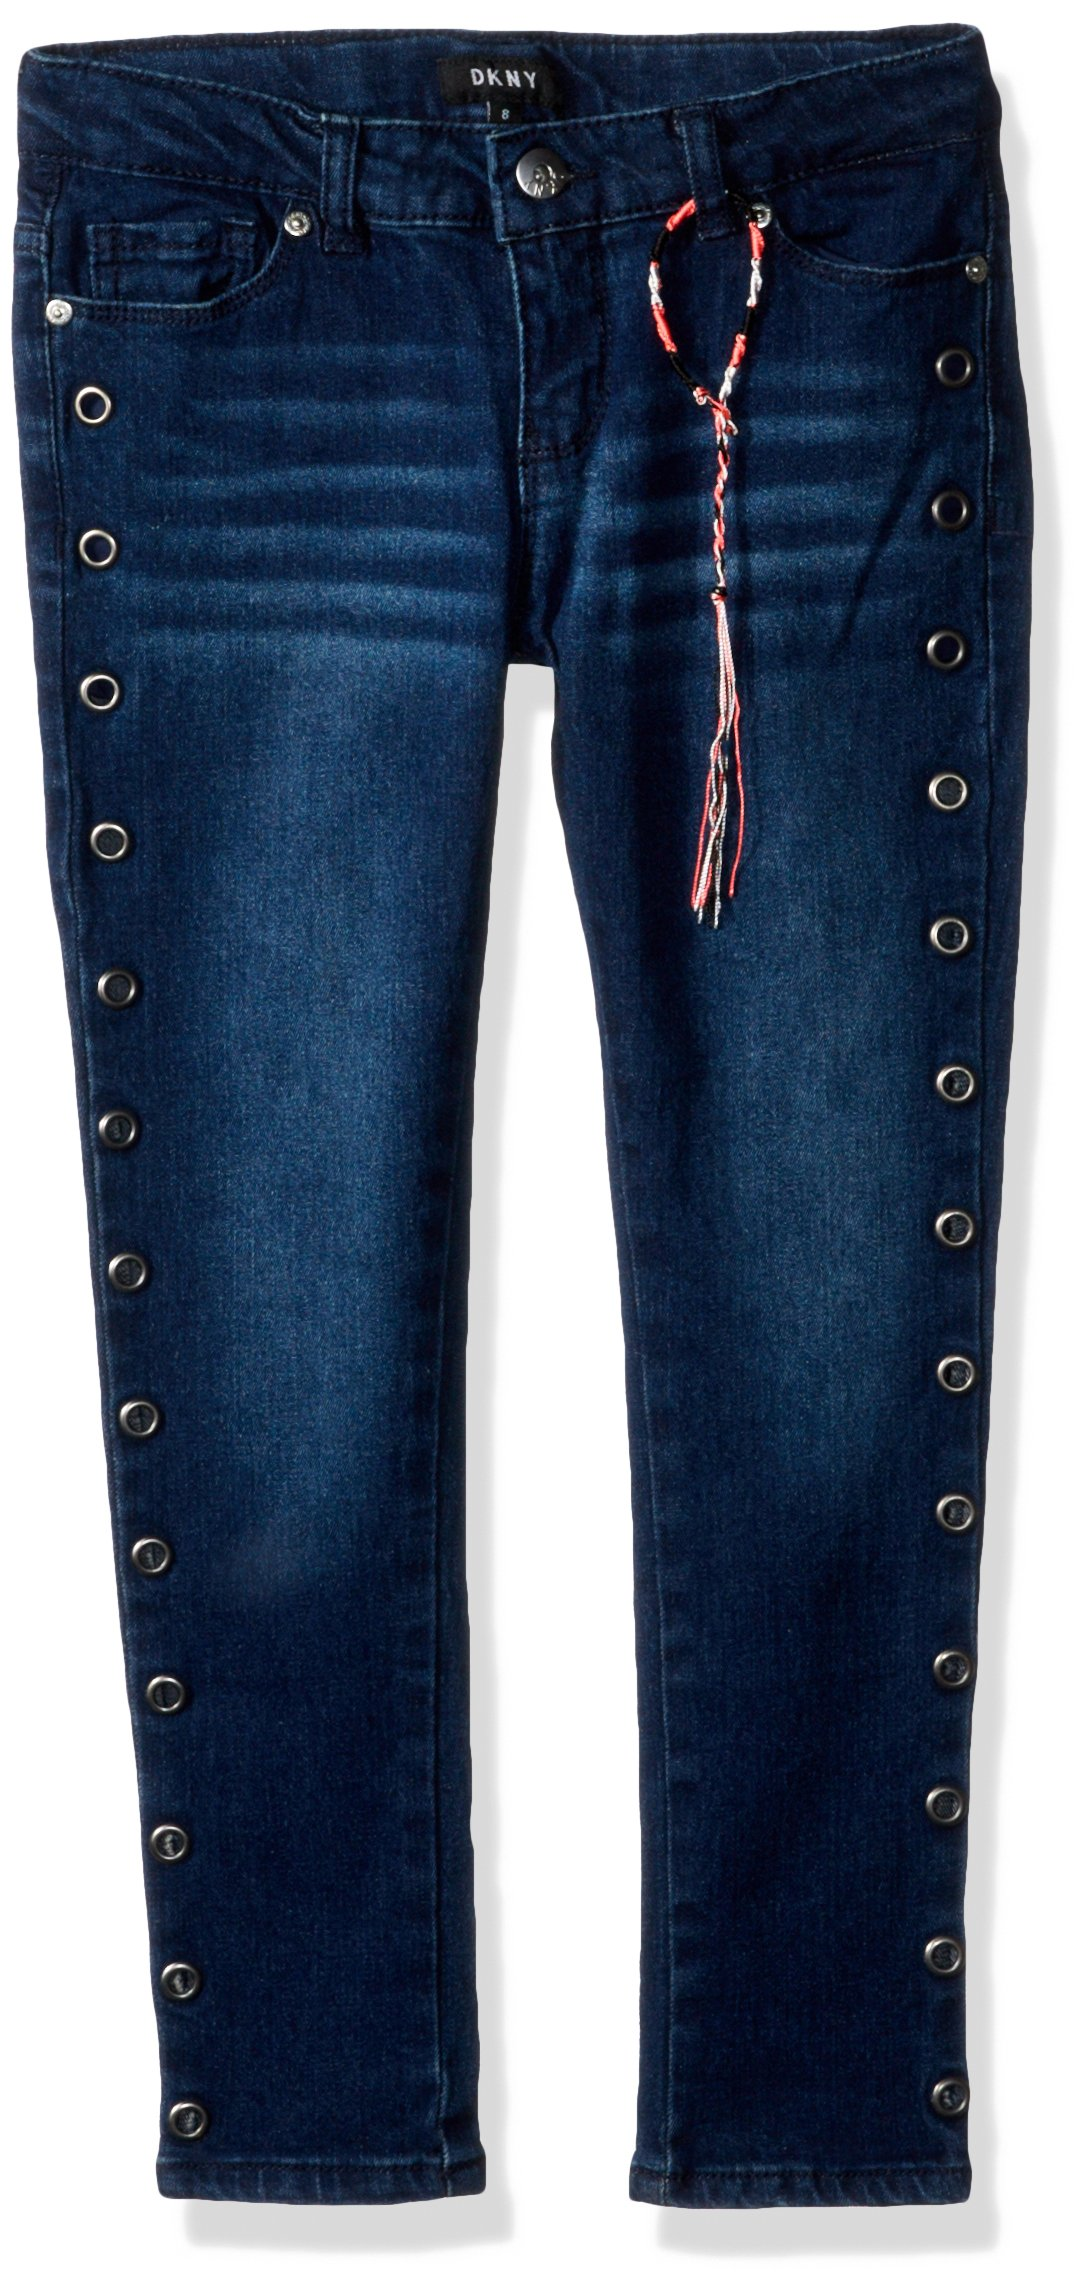 DKNY Girls' Big' Jean, Grommets Midtown Indigo, 12